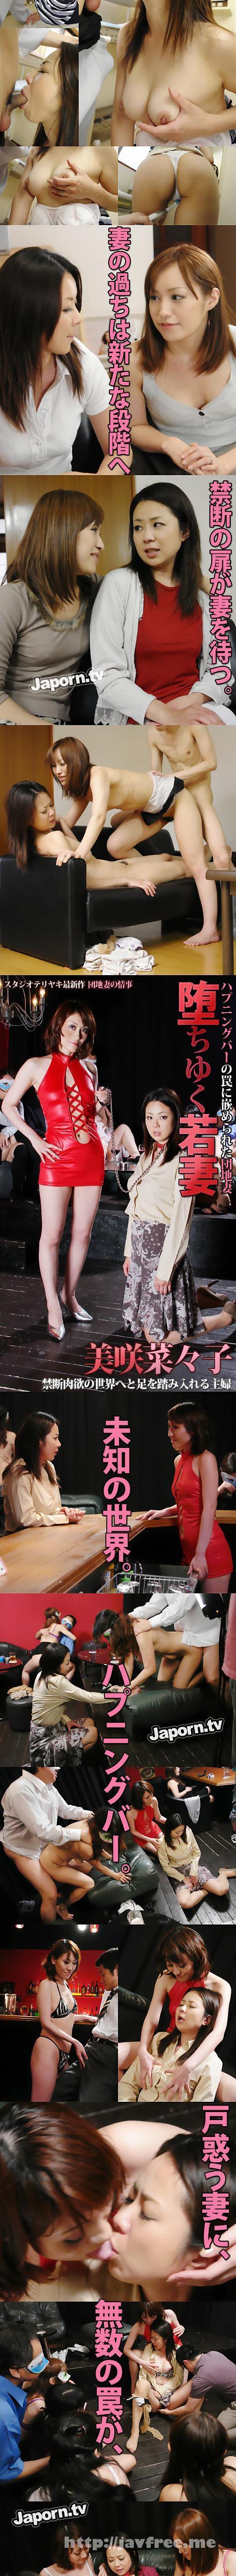 [CT 26] 団地妻の情事 : 美咲菜々子 美咲菜々子 団地妻の情事 Nanako Misaki CT